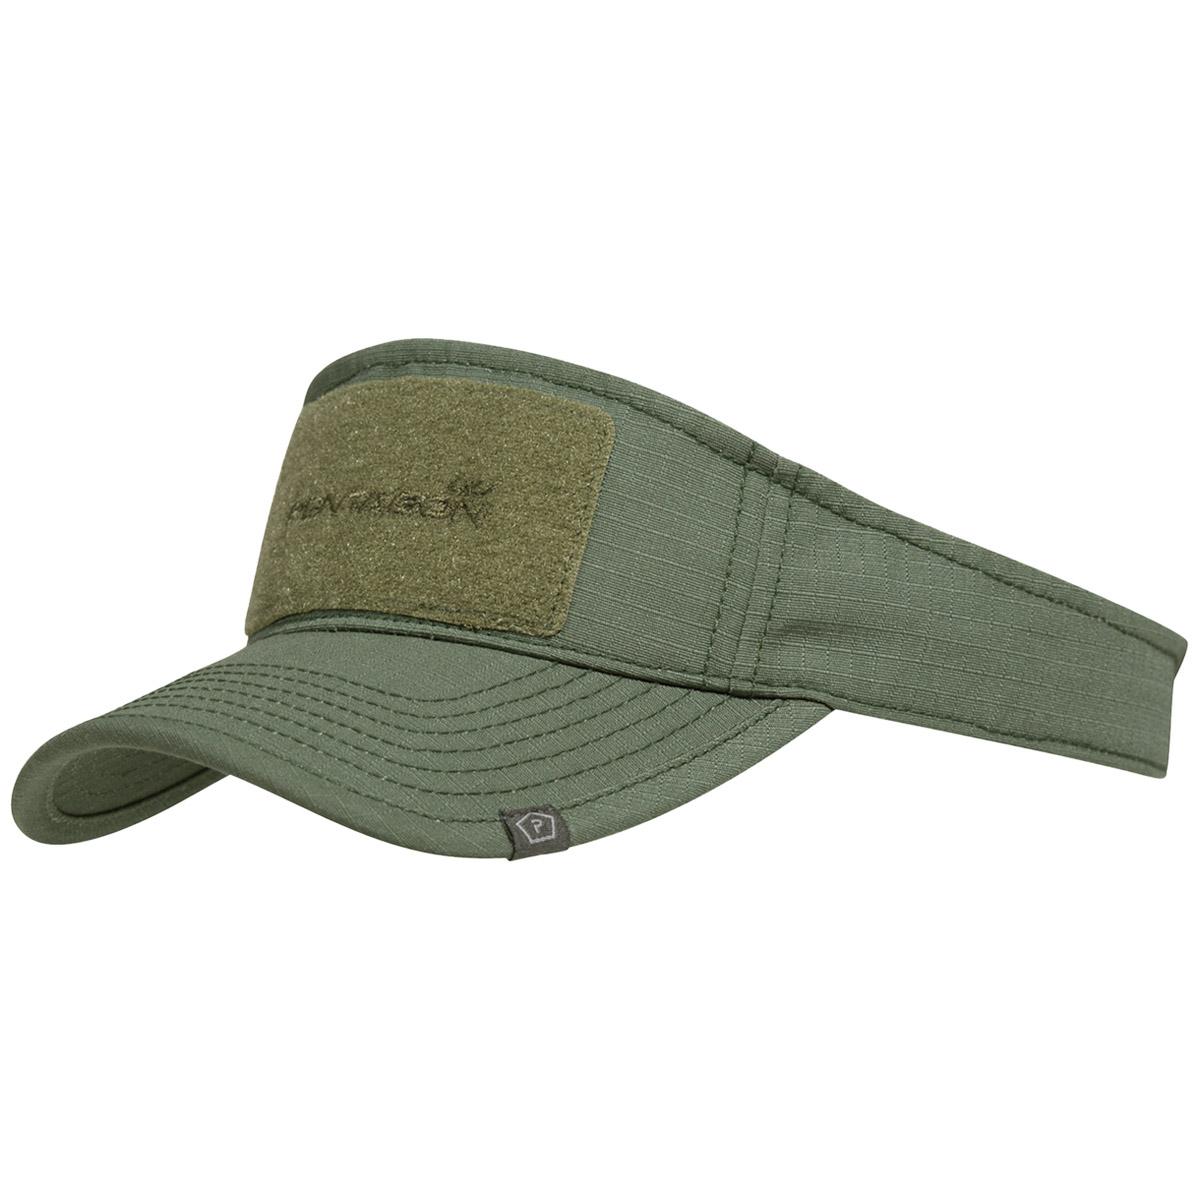 Details about Pentagon Visor Hiking Baseball Cap Outdoor Travel Patrol Mens  Sun Hat Camo Green 5ca59bd449a